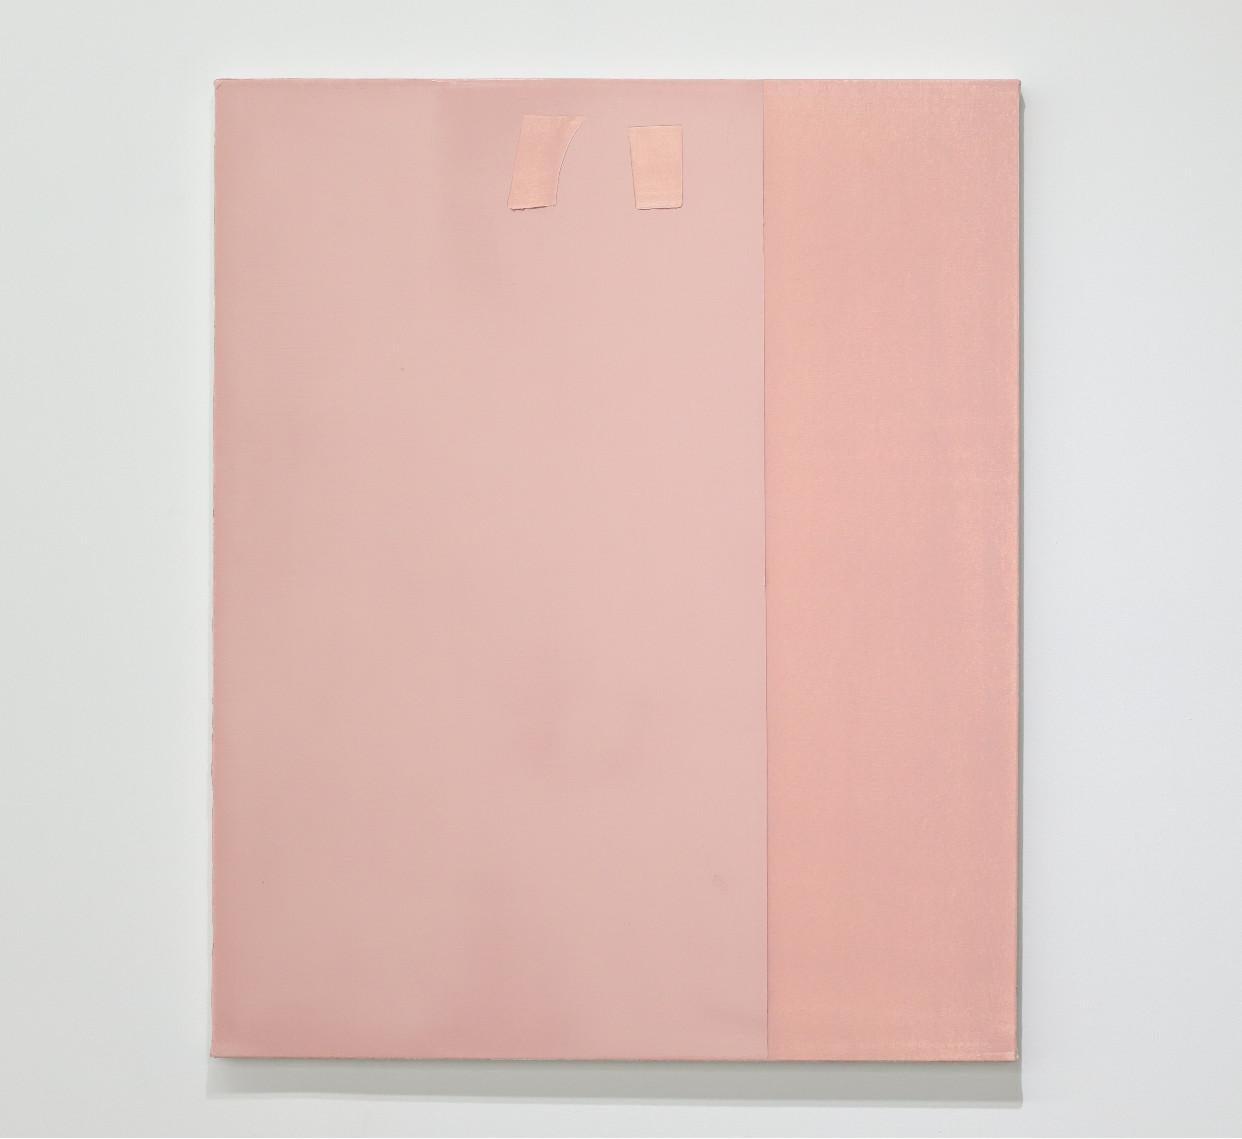 Contemporary minimalist oil painting by GJ Kimsunken 'Figuration 19.19' Pink